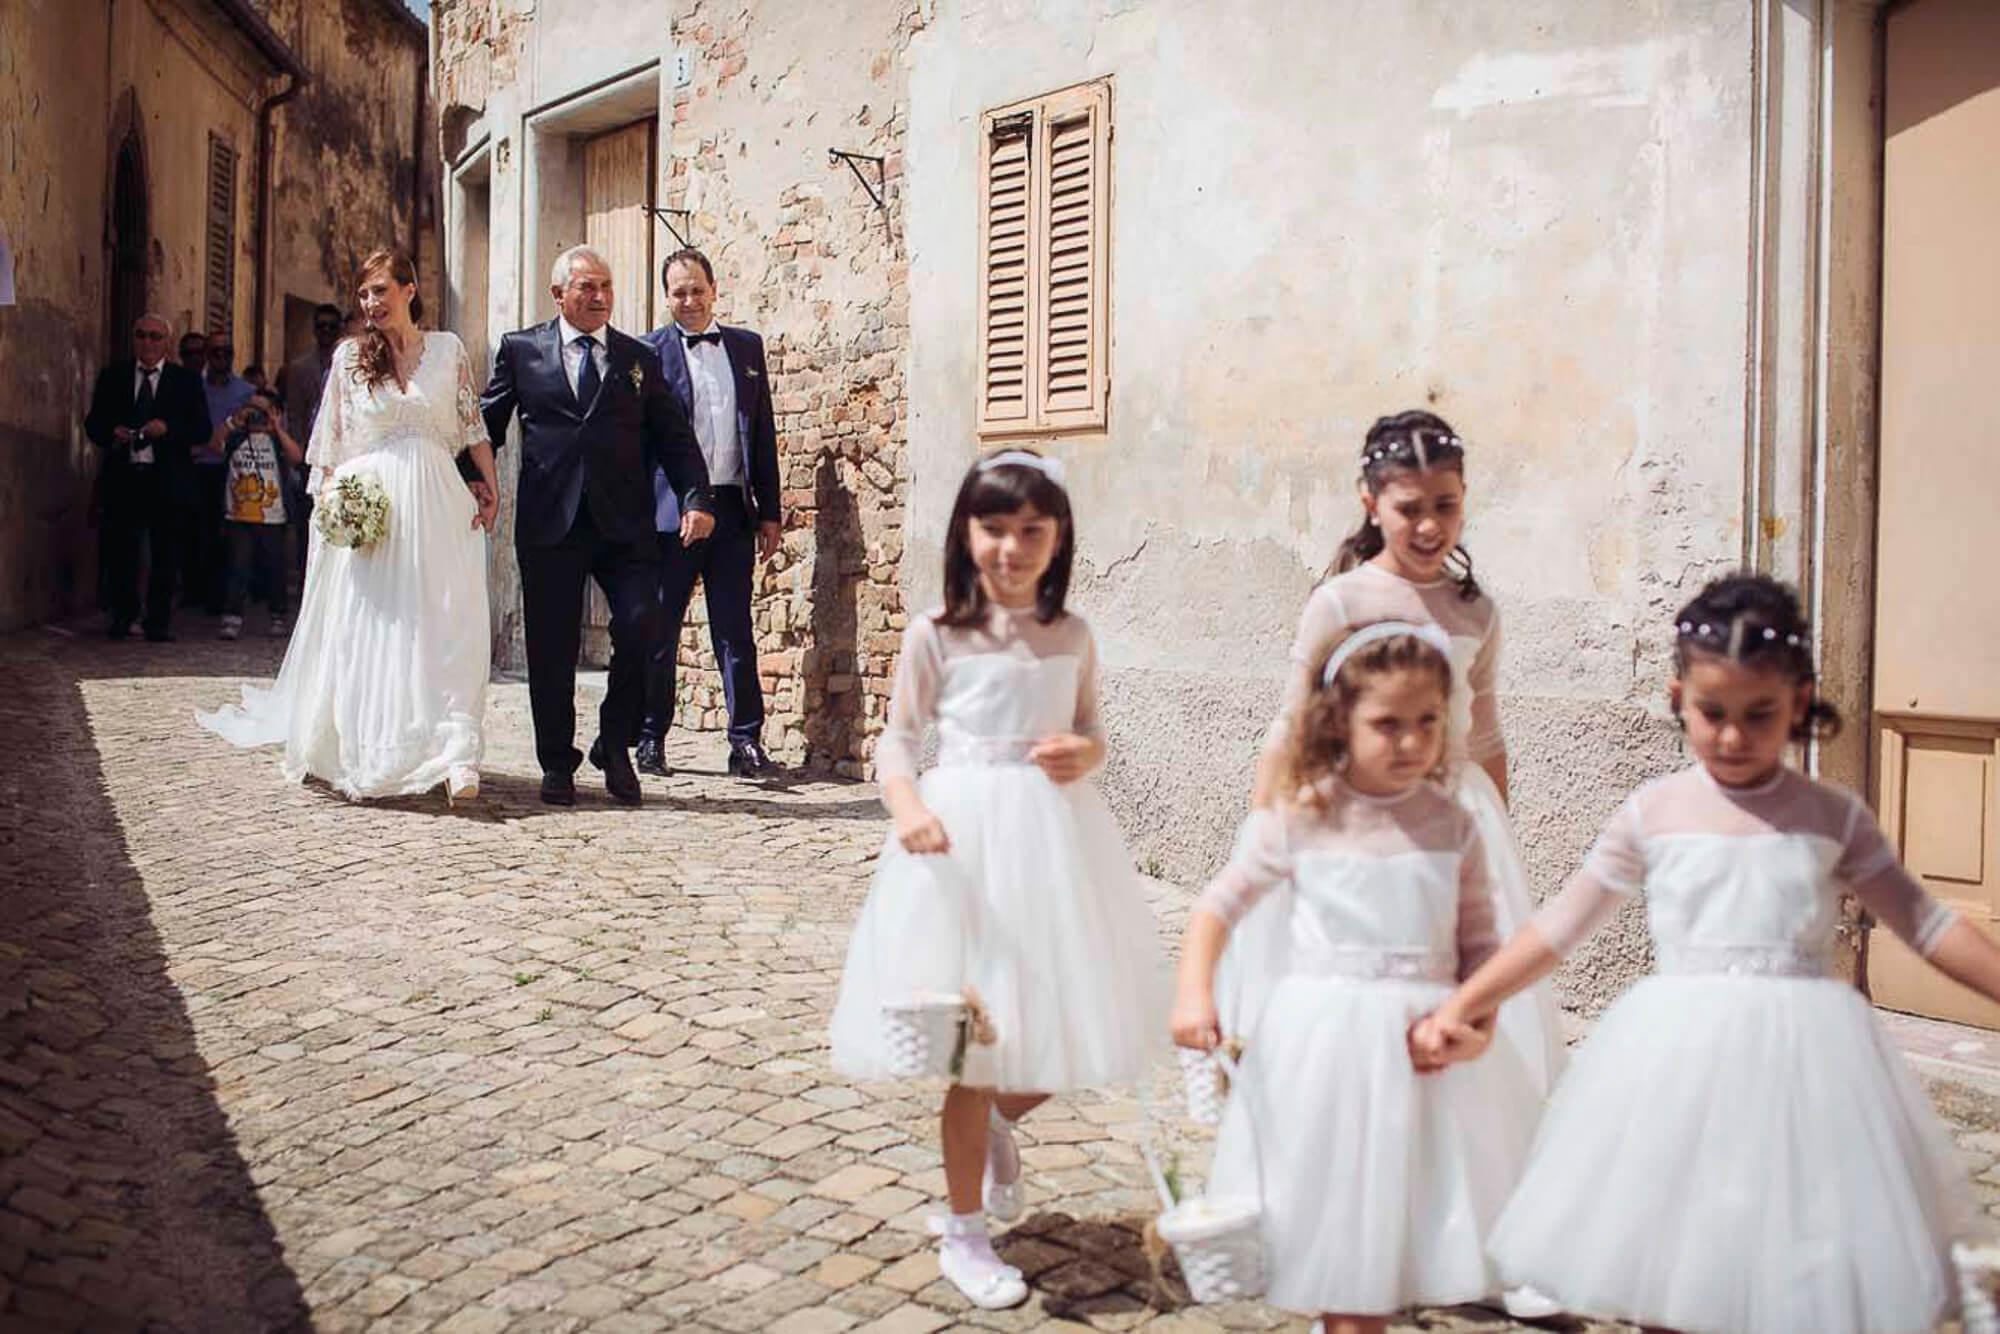 60_wedding_marche.jpg